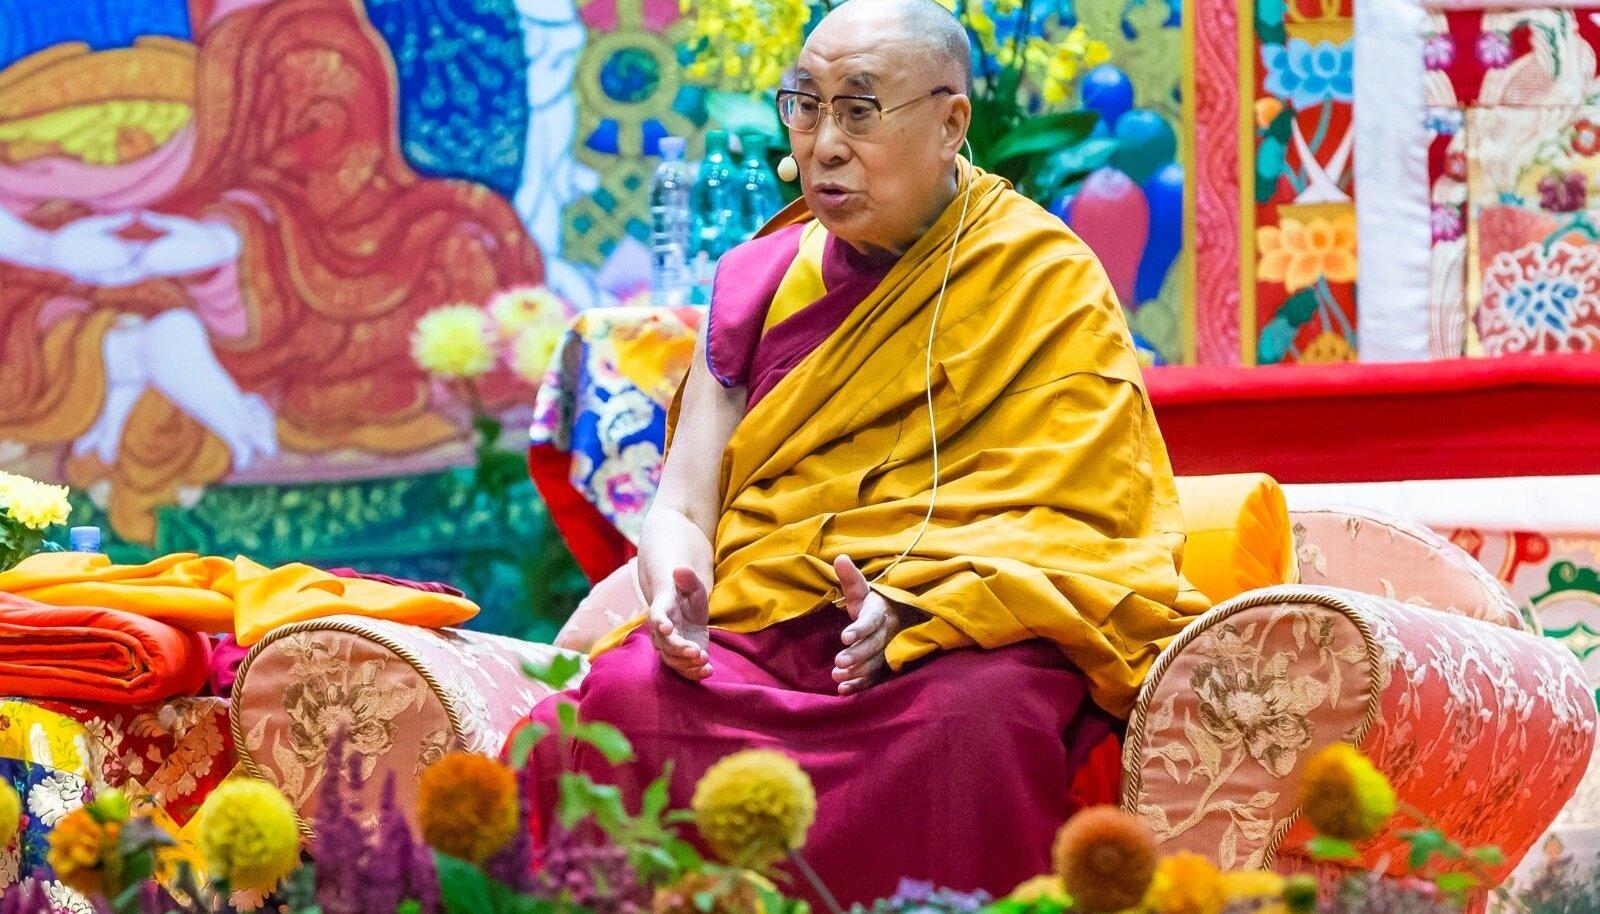 Dalai-laama Riias 2017